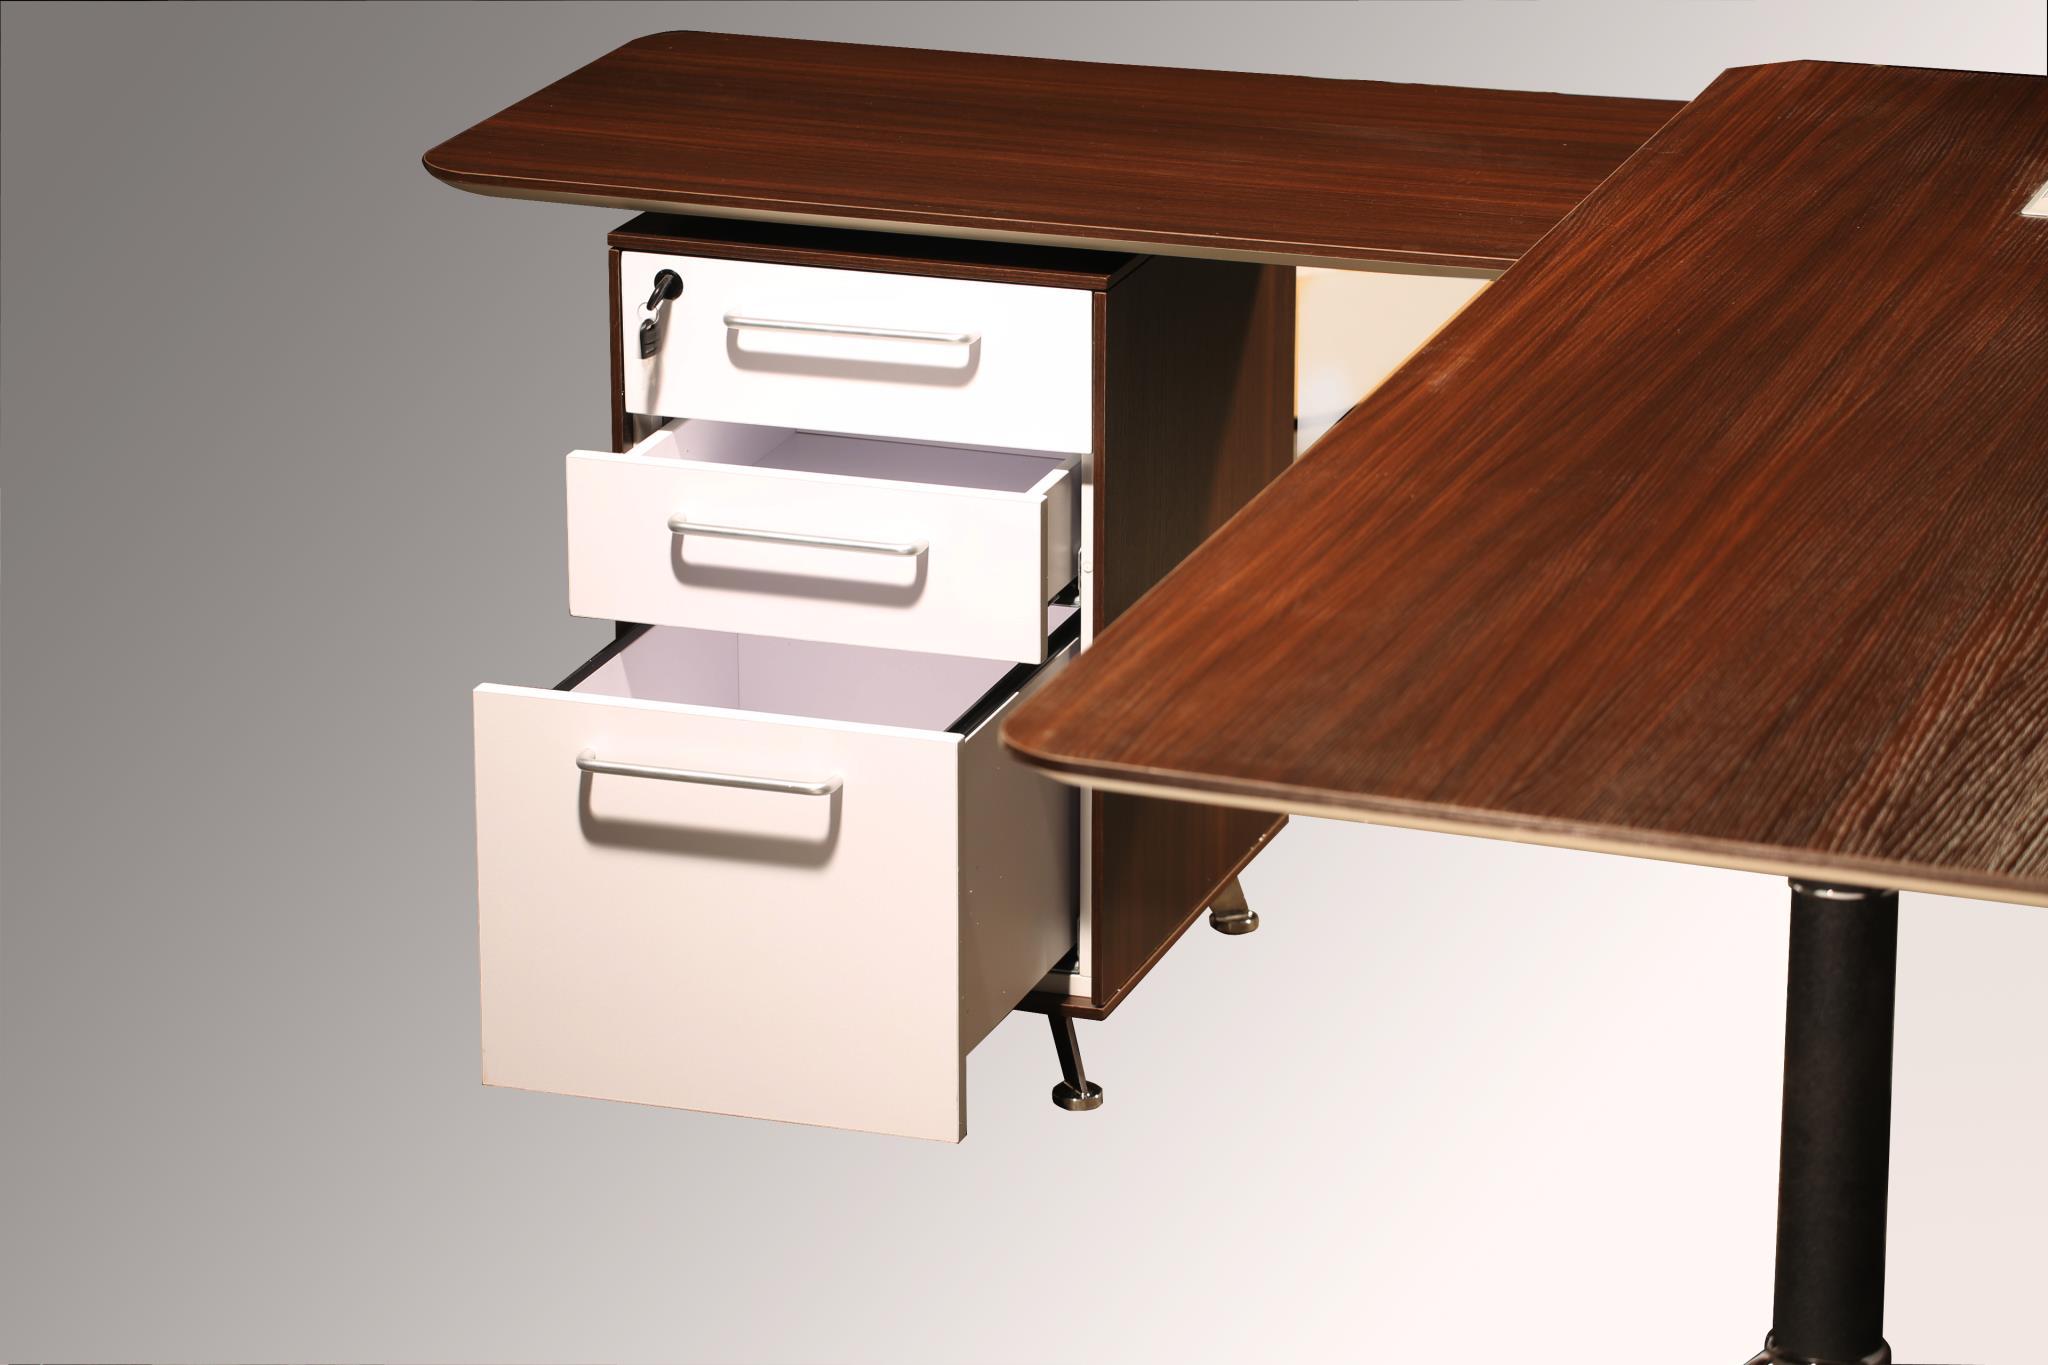 Morgan director left return melamine l shape desk teak national office interiors and liquidators - Teak office desk ...